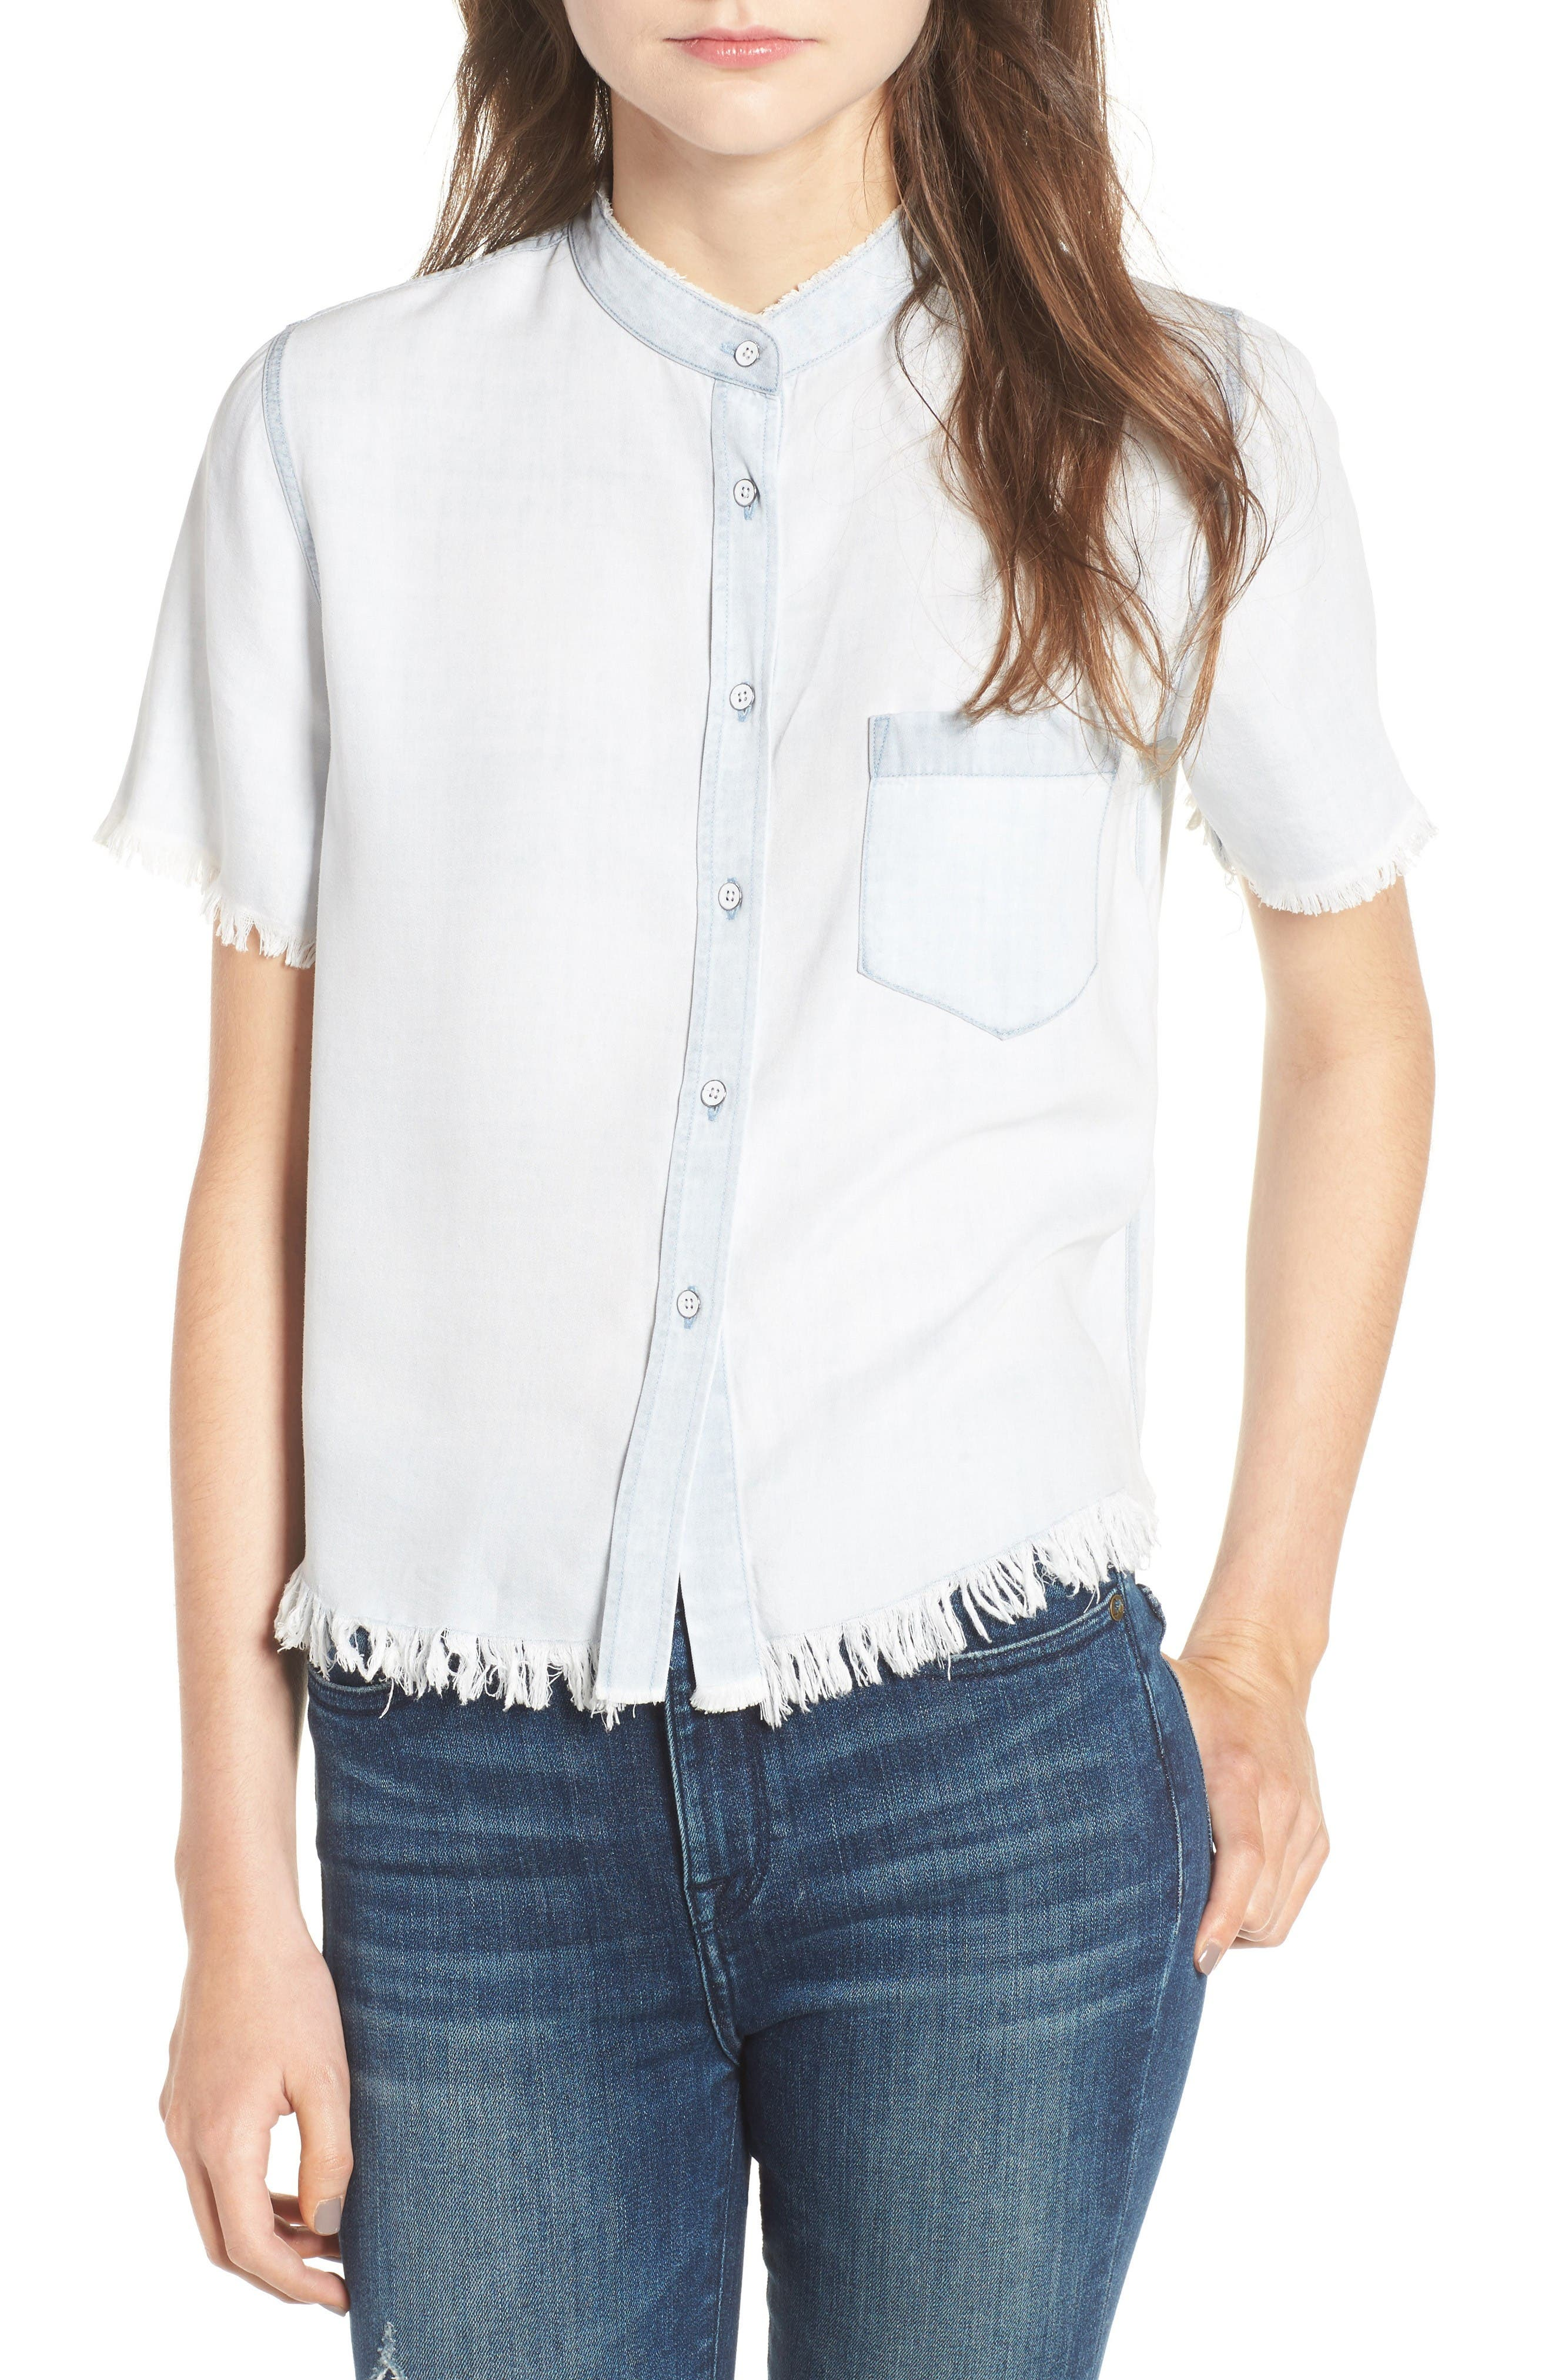 Montauk Shirt,                             Main thumbnail 1, color,                             Bleached